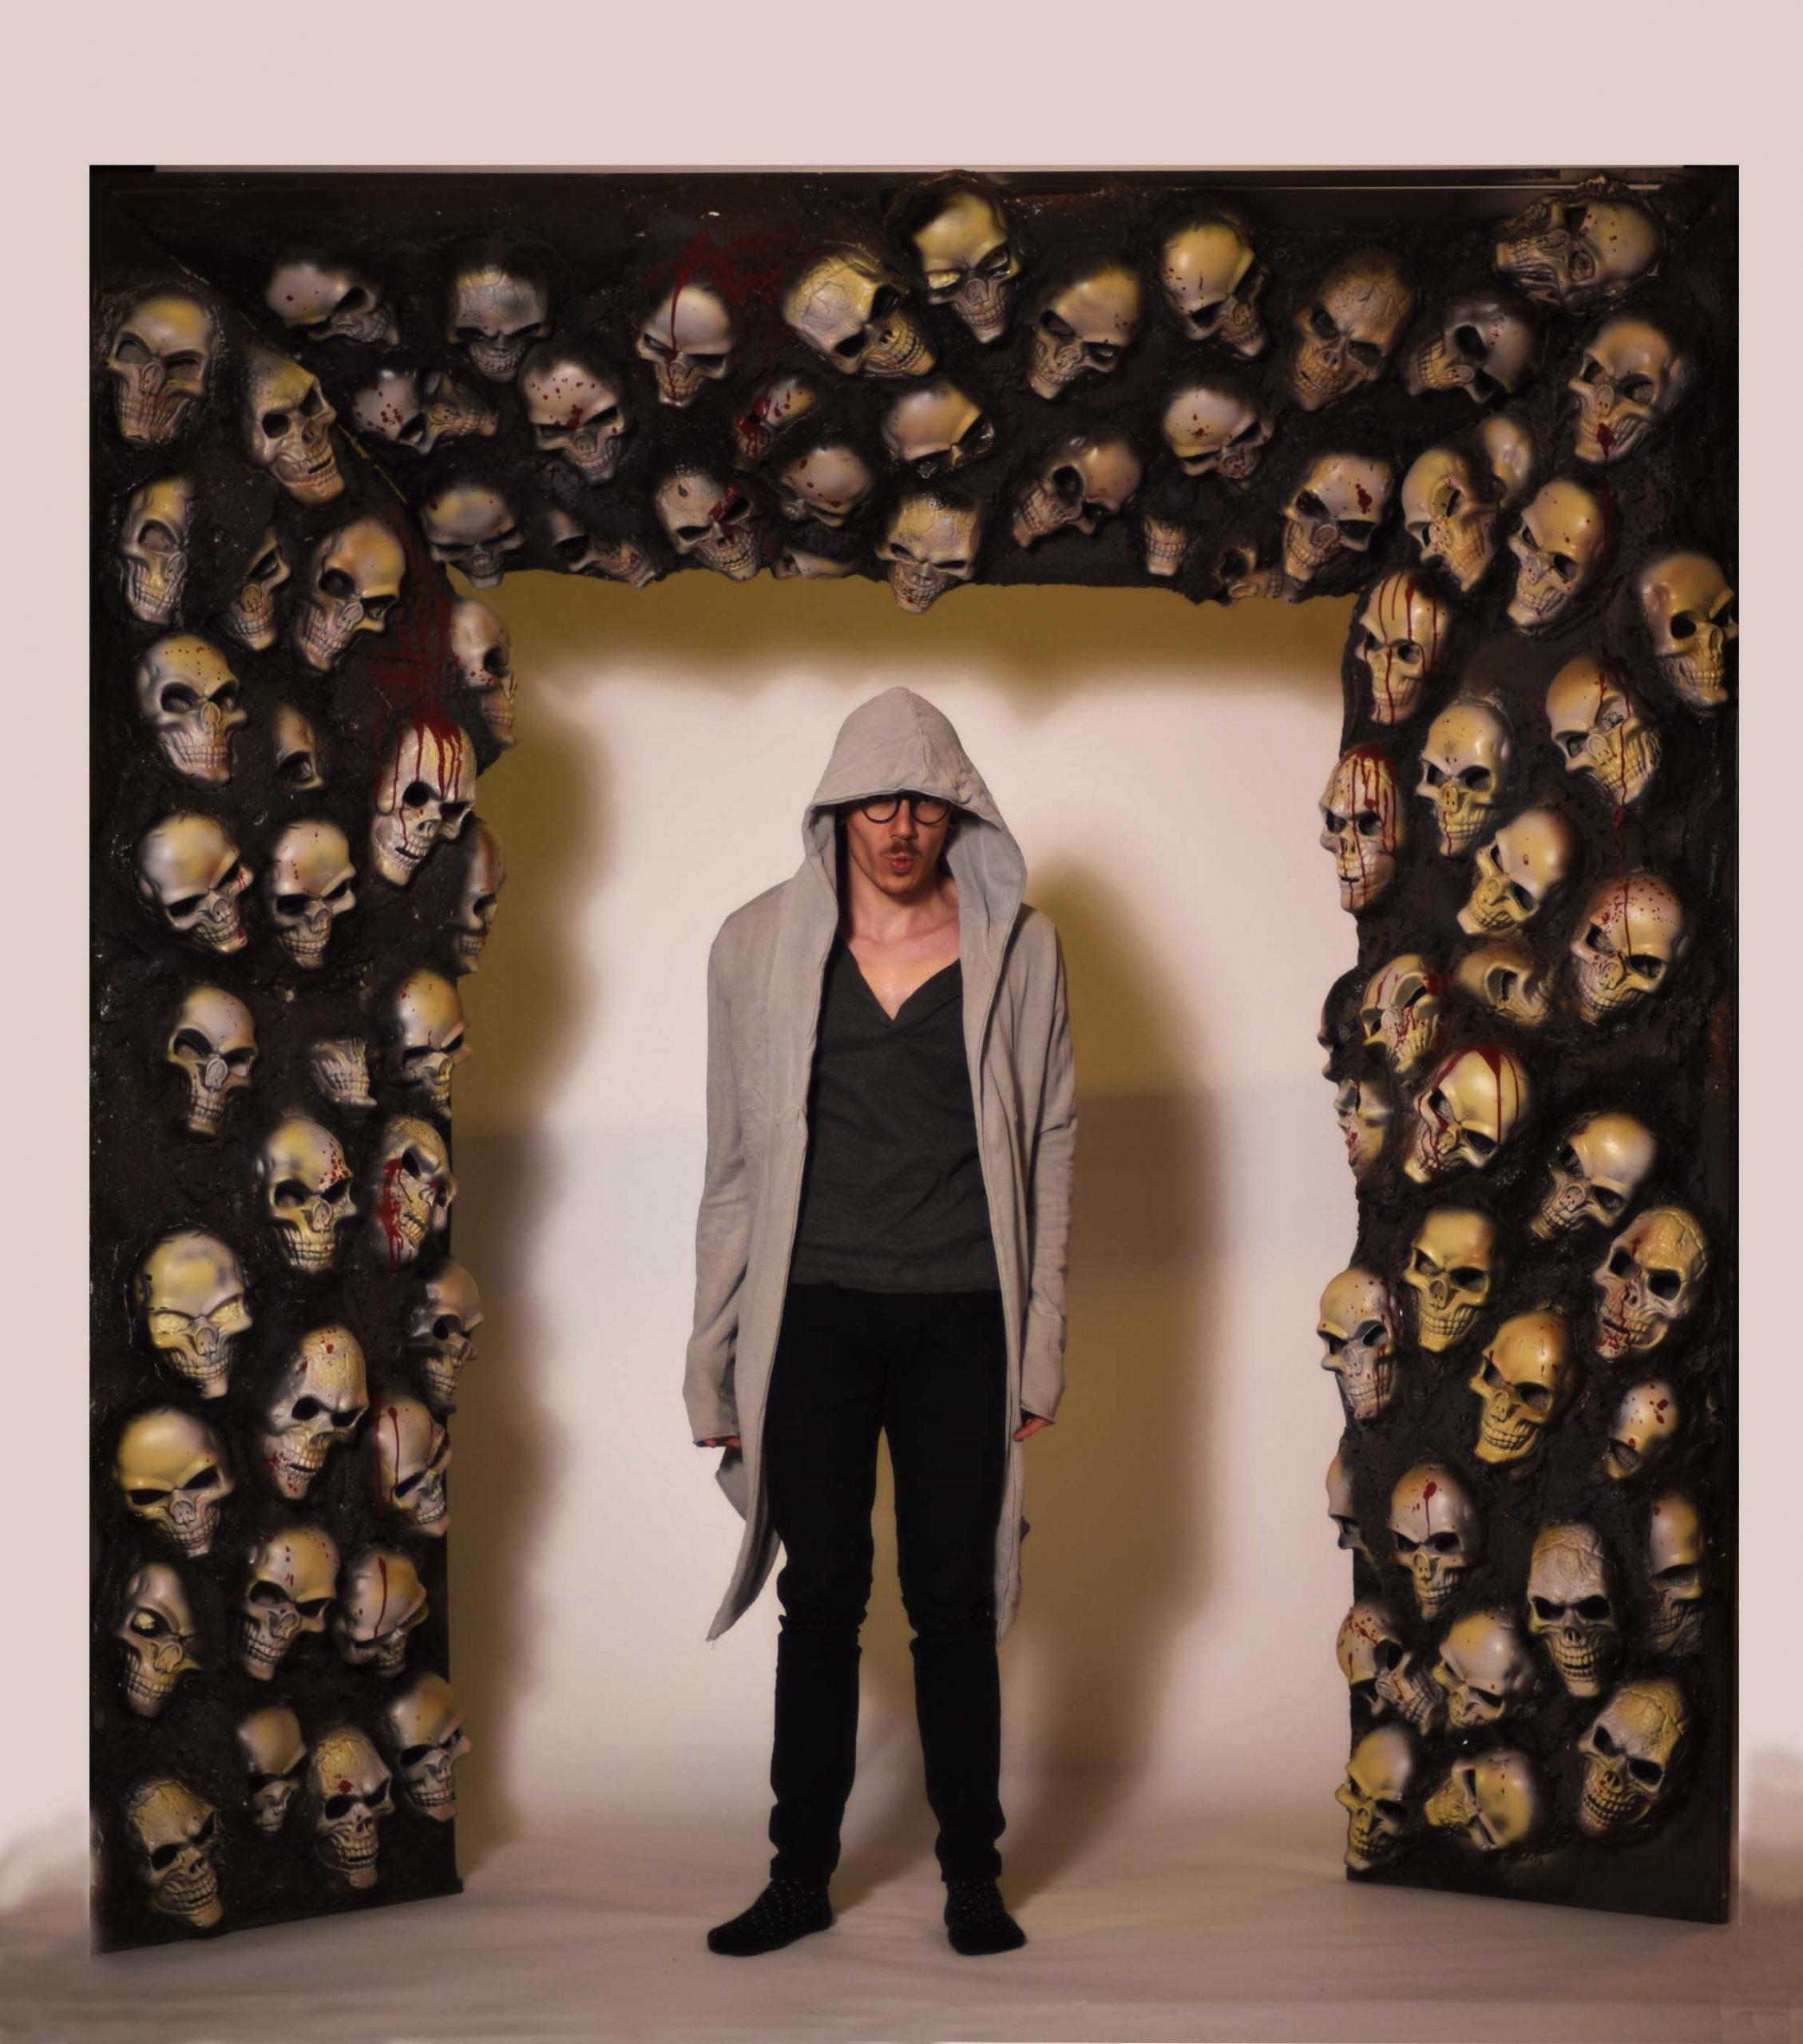 Poarta cranii Halloween, inchiriere decor petrecere tematica